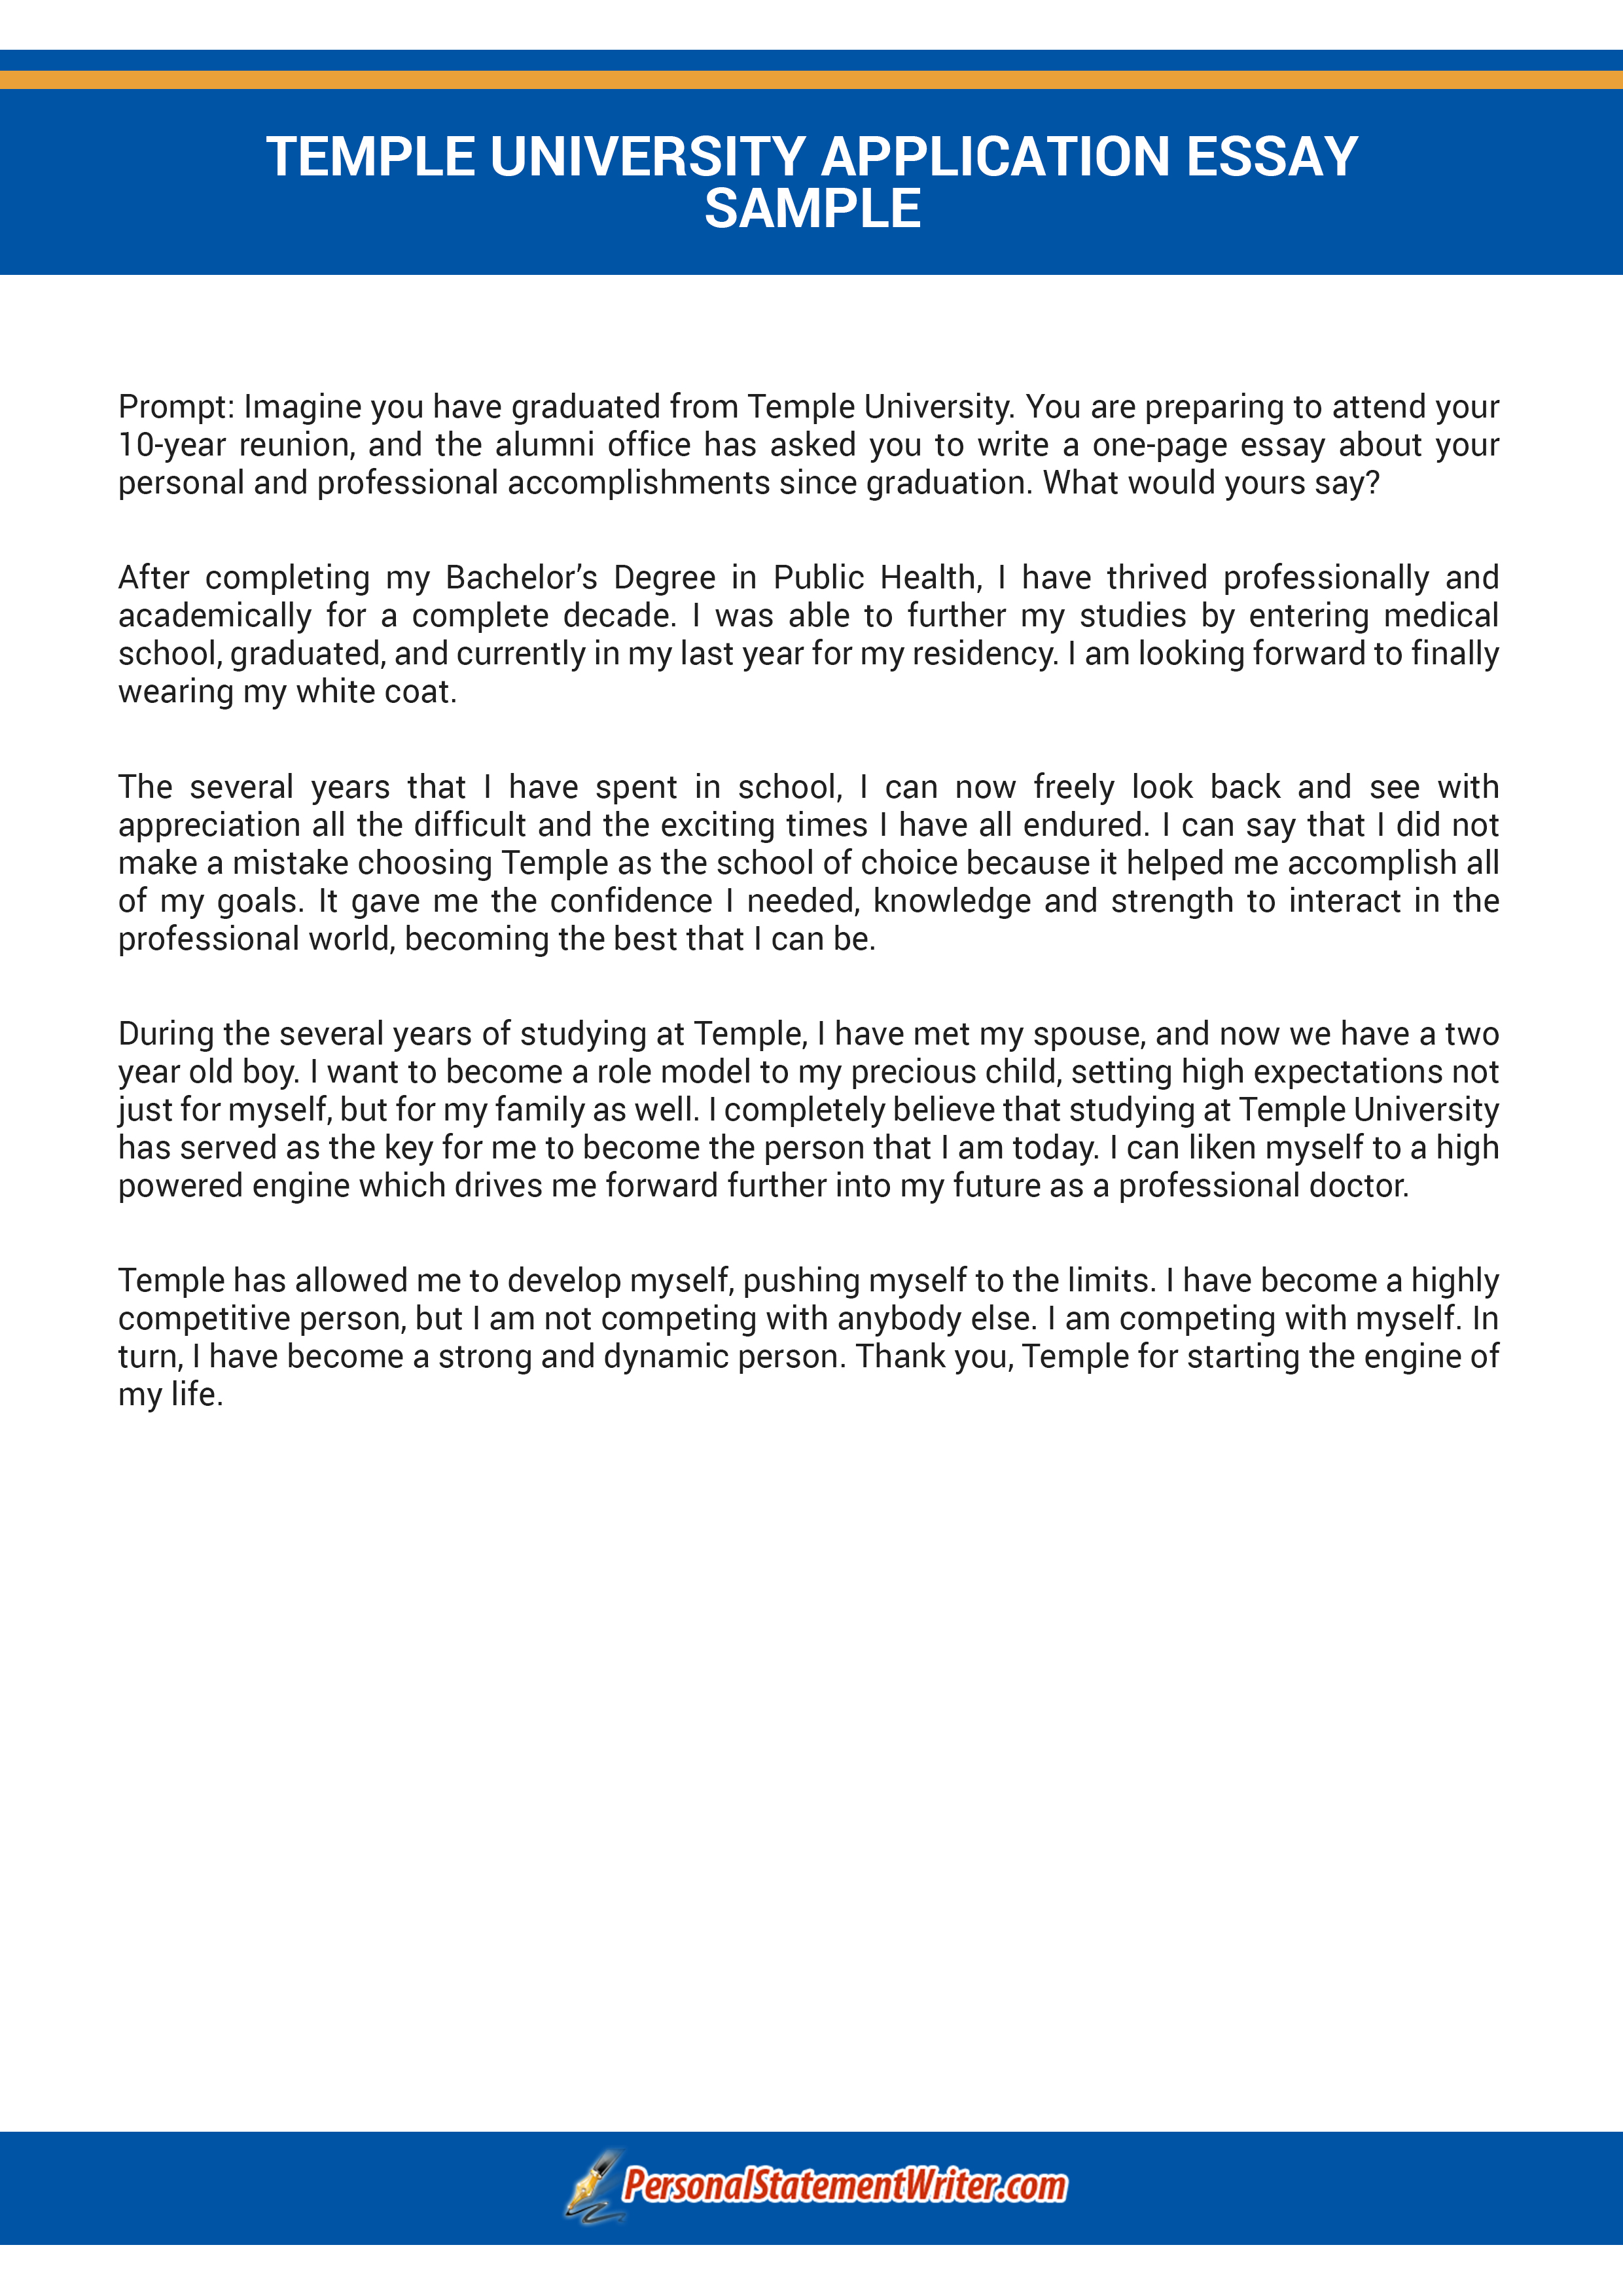 Response Temple University Essay Prompt